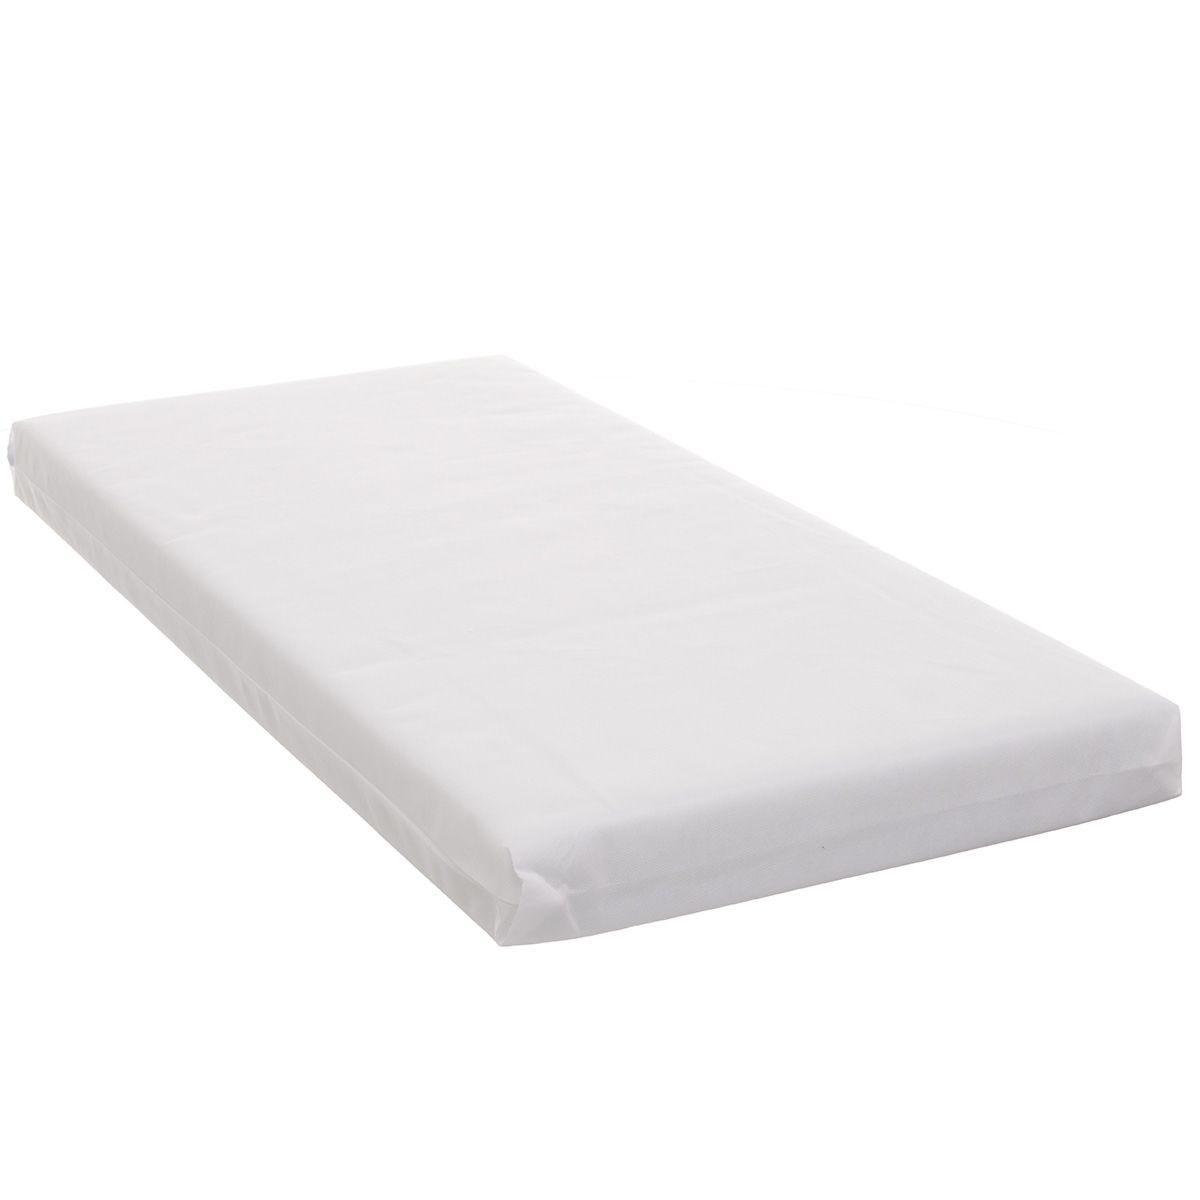 Obaby Foam 140 X 70 Cot Bed Mattress